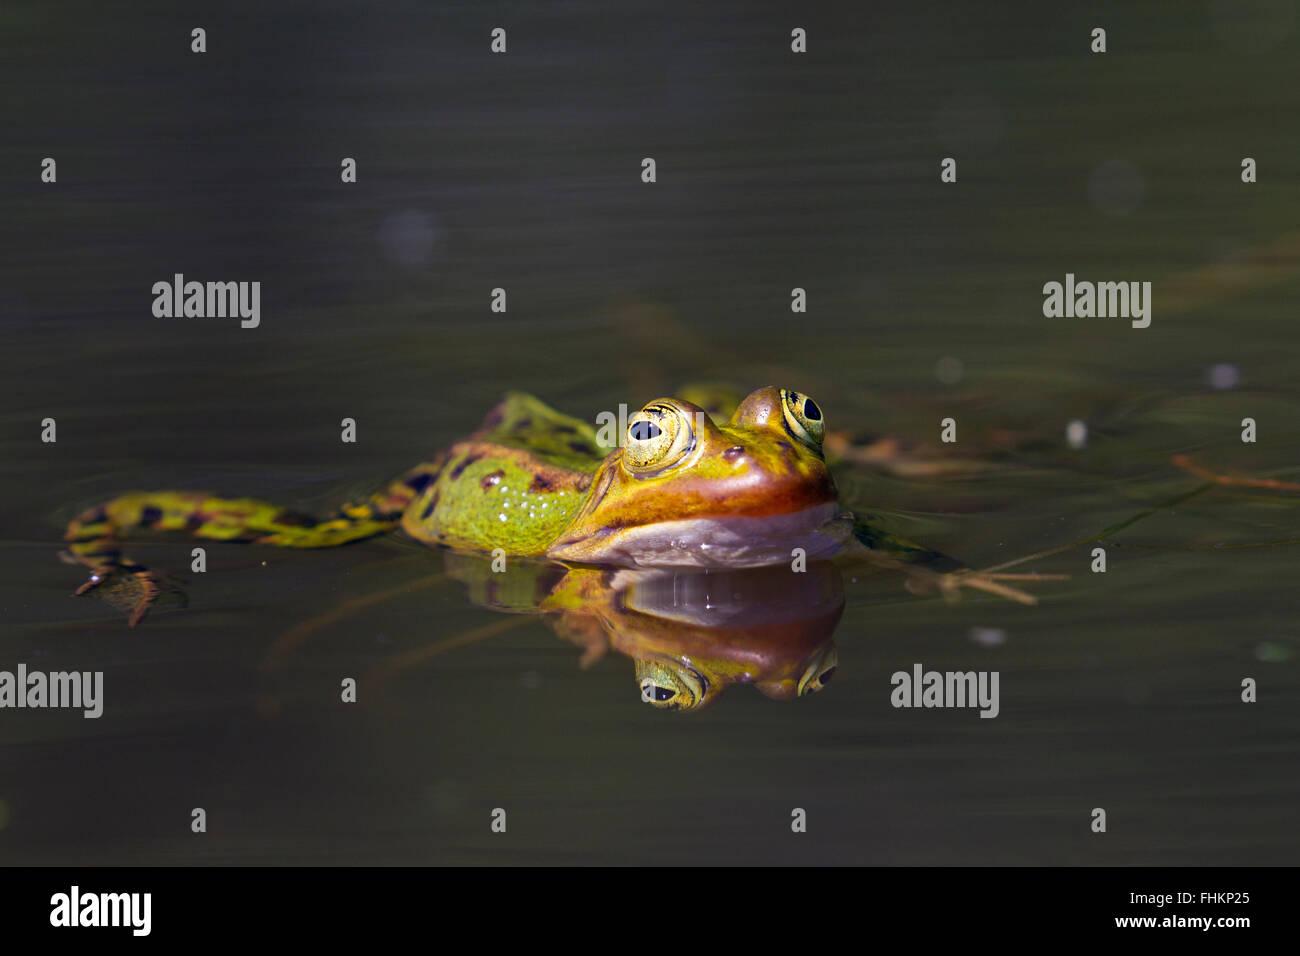 Edible frog / common water frog / green frog (Pelophylax kl. esculentus / Rana kl. esculenta) swimming in pond - Stock Image